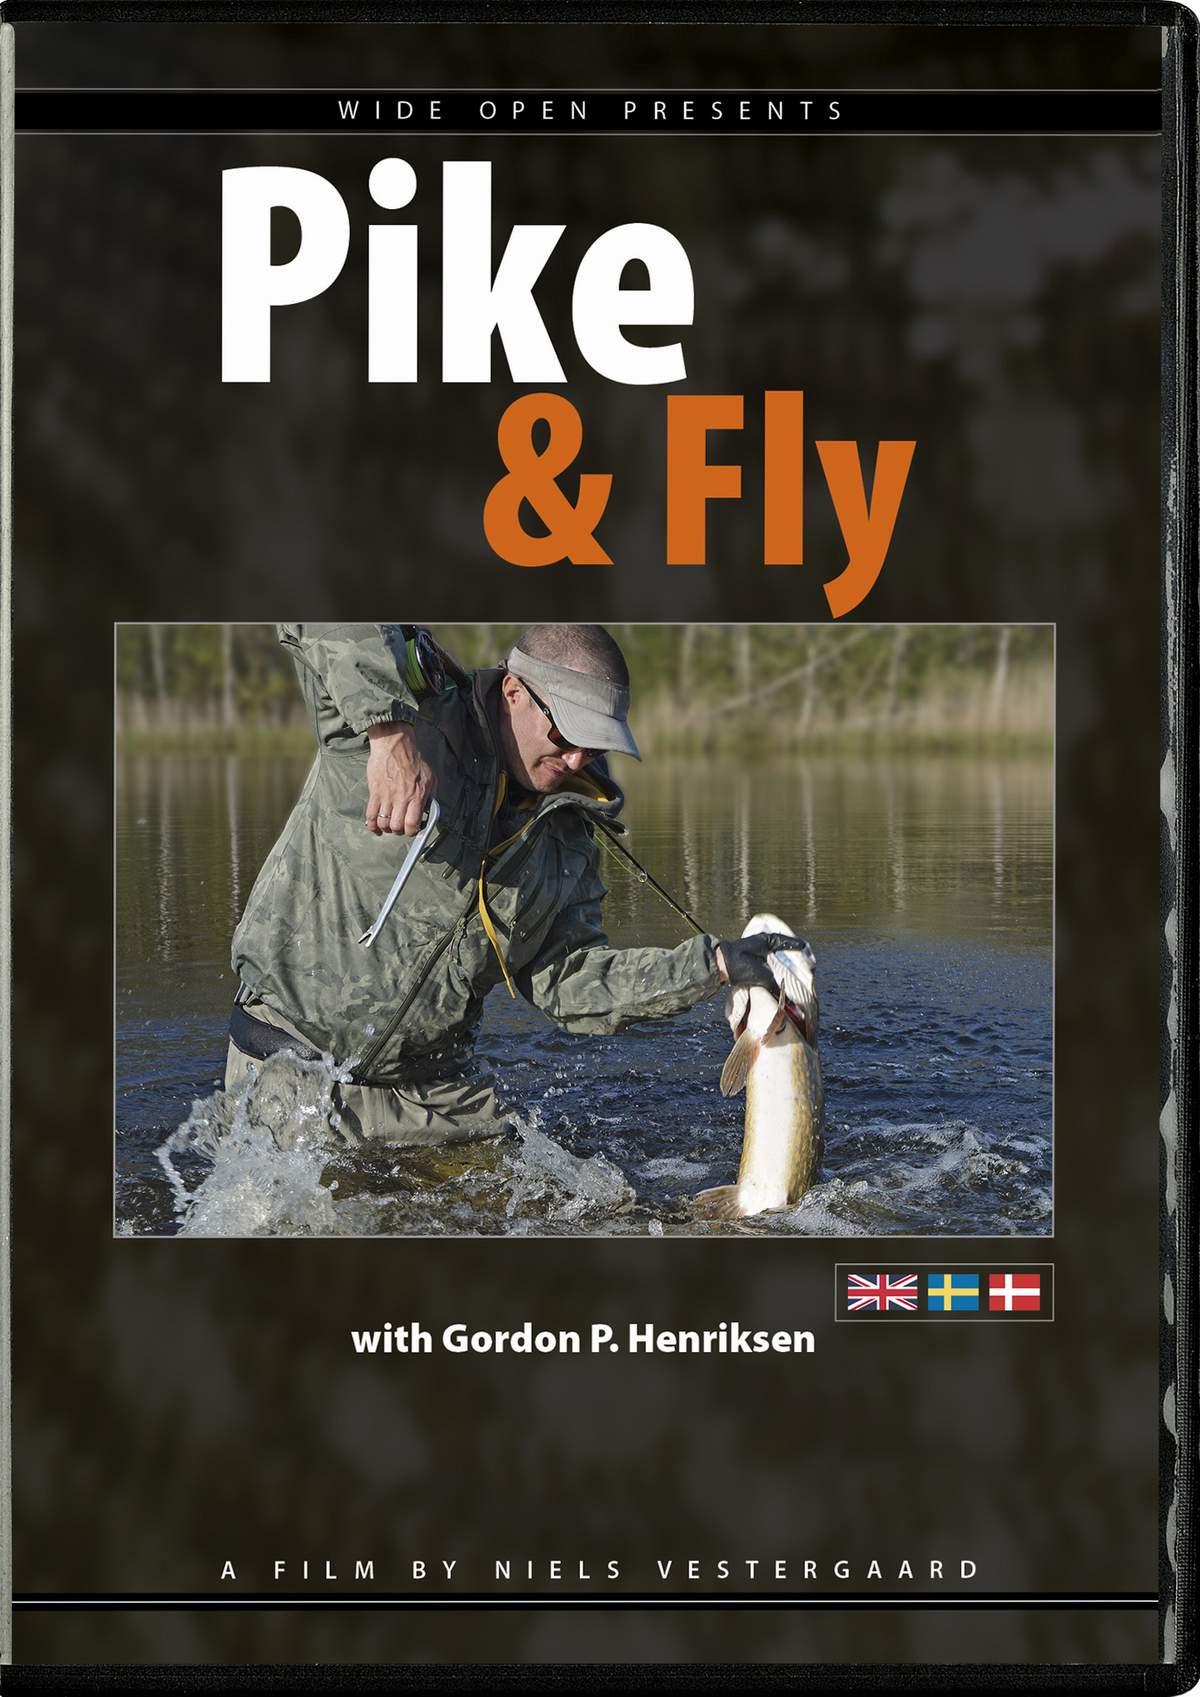 N/A Pike & fly dvd på fiskegrej.dk